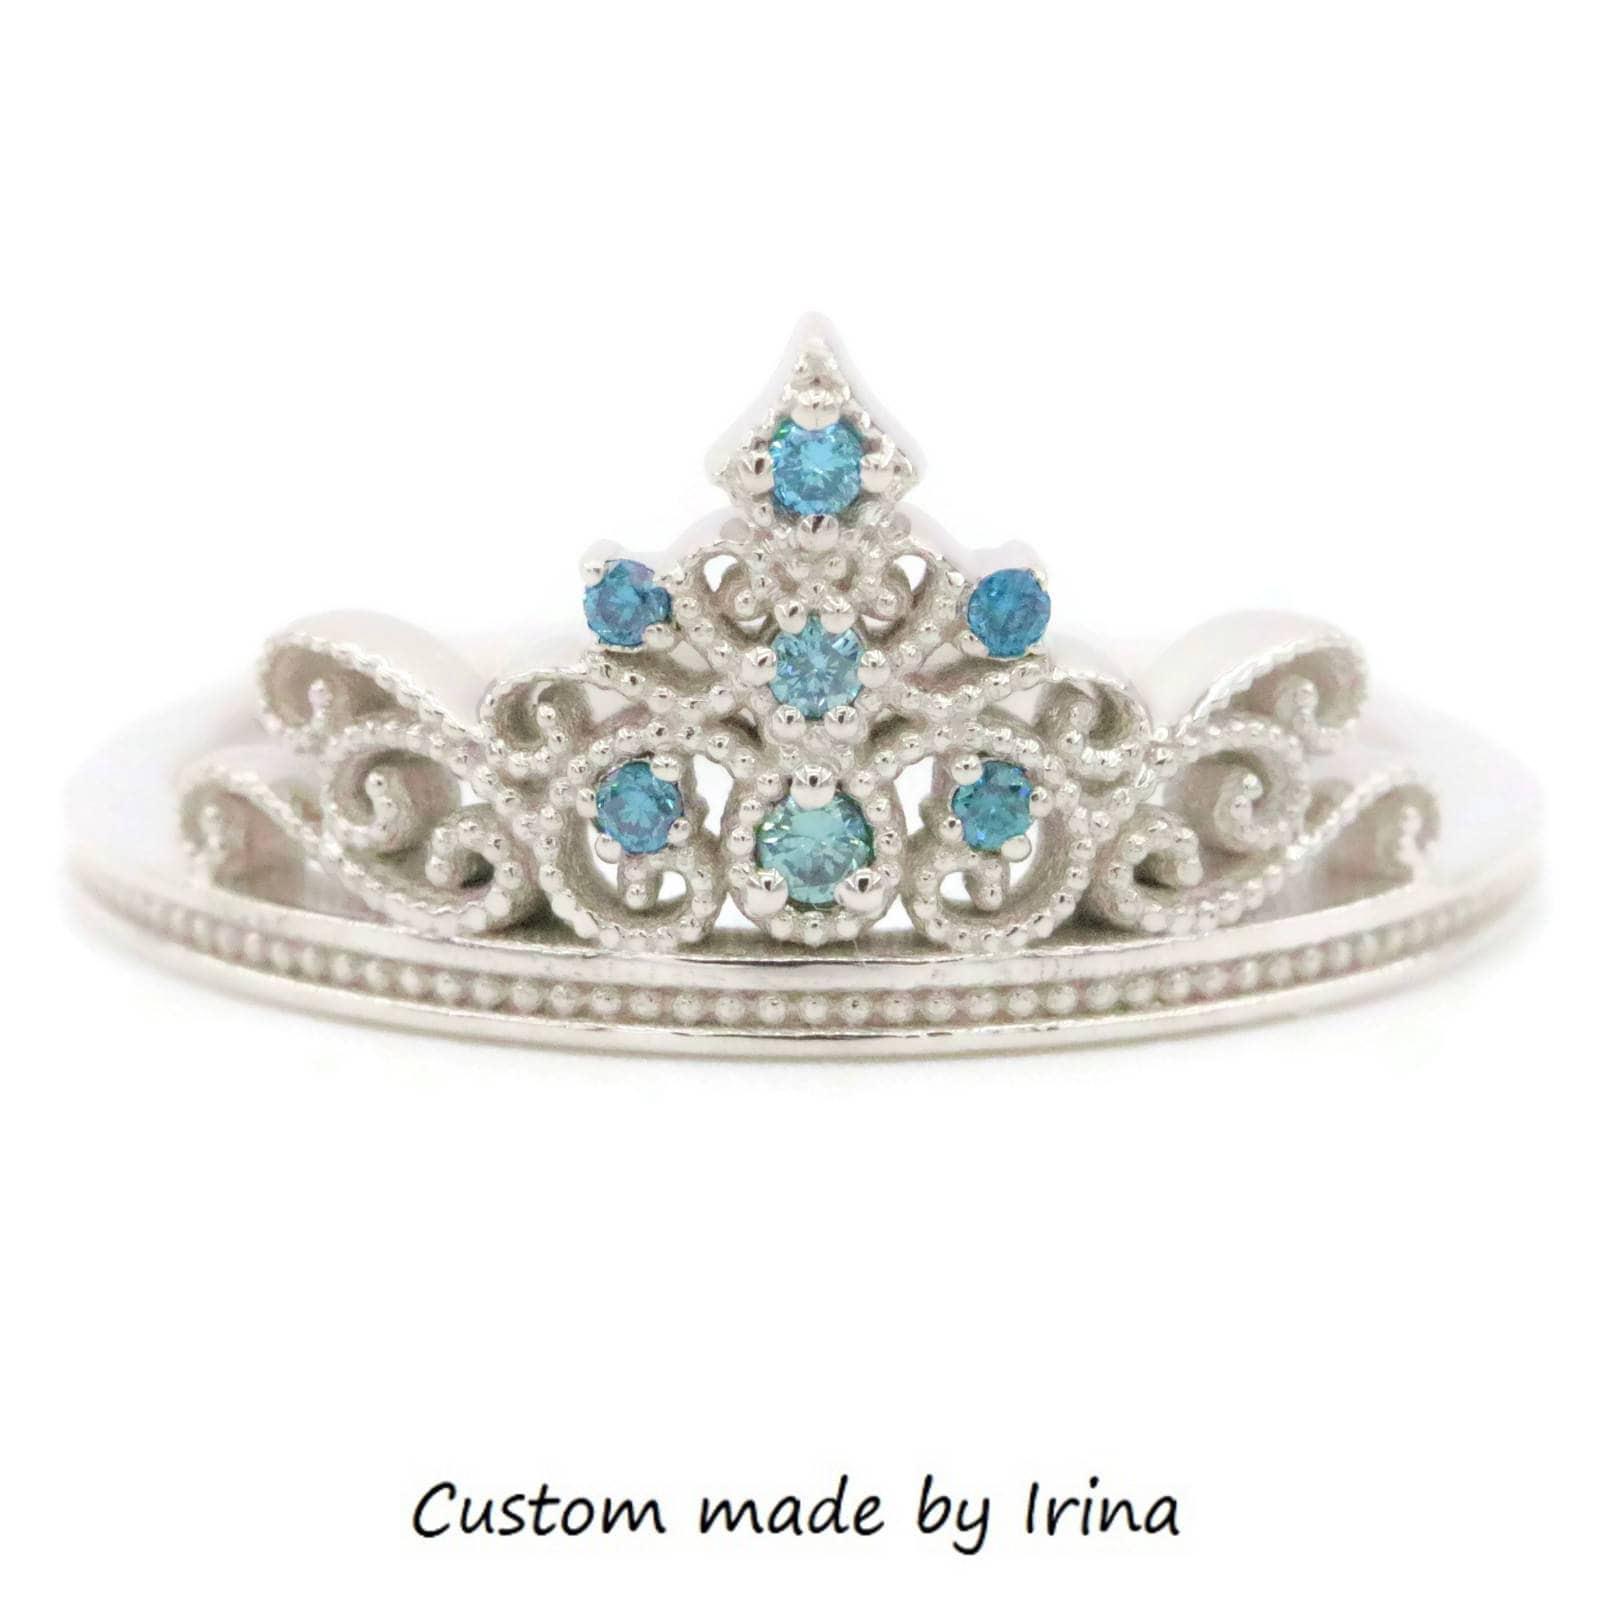 Fairy Tales Wedding Ring Sets: Tiara Fairy Tale Ring, Princess Ring, Tiara Ring, Wedding